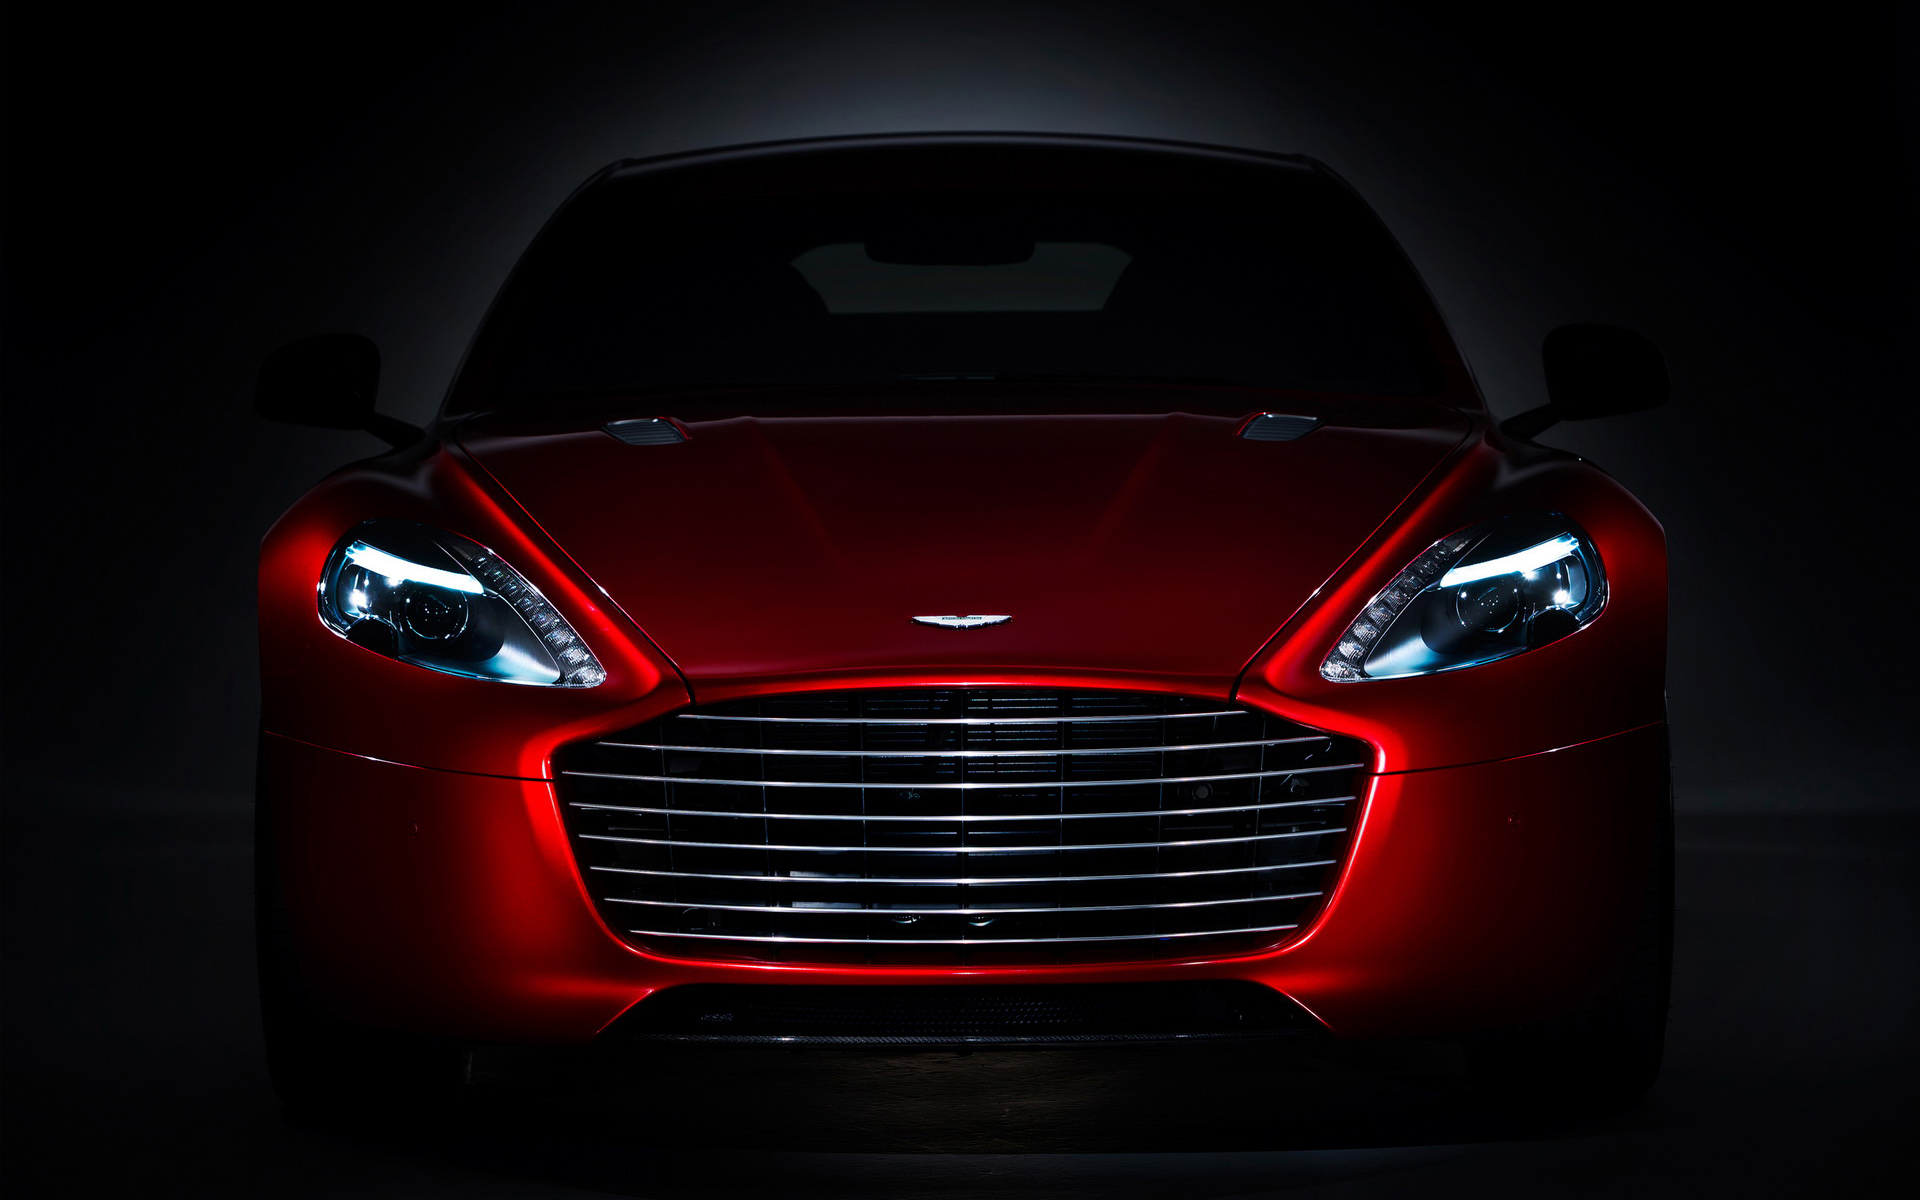 Aston Martin Rapide S Wallpaper Hd Car Wallpapers Id 3335